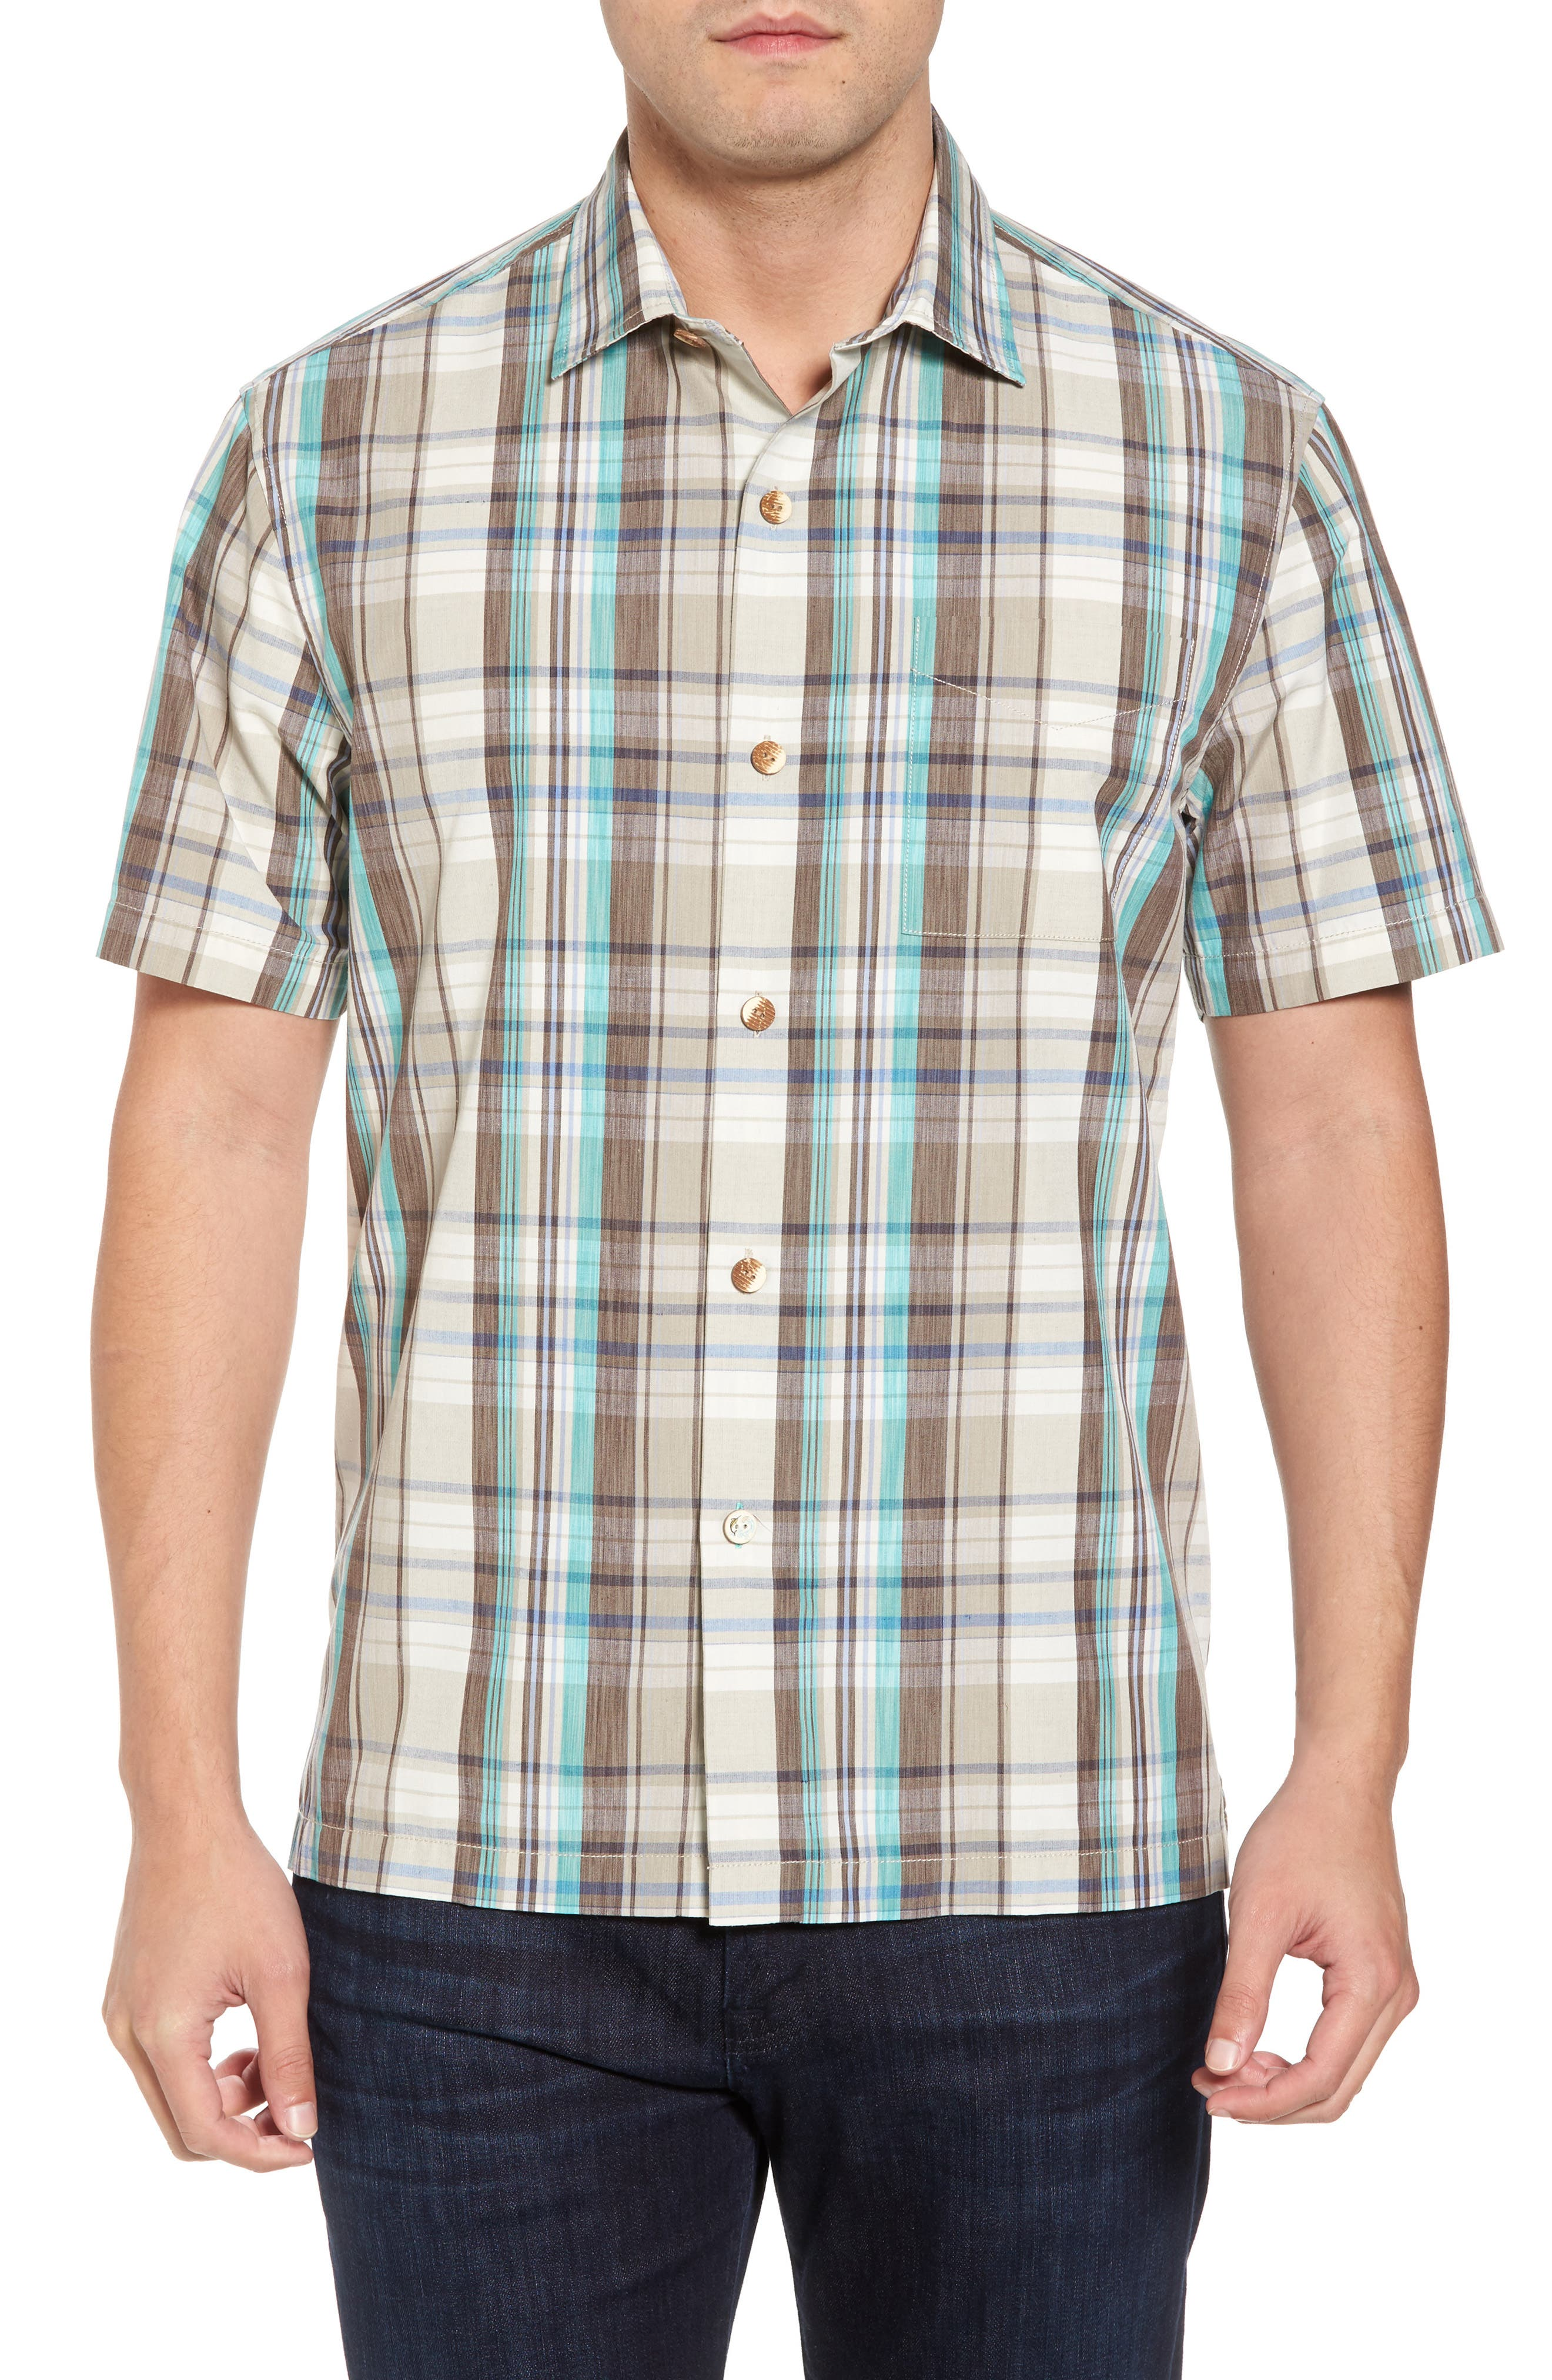 Royal Palm Plaid Sport Shirt,                             Main thumbnail 1, color,                             200